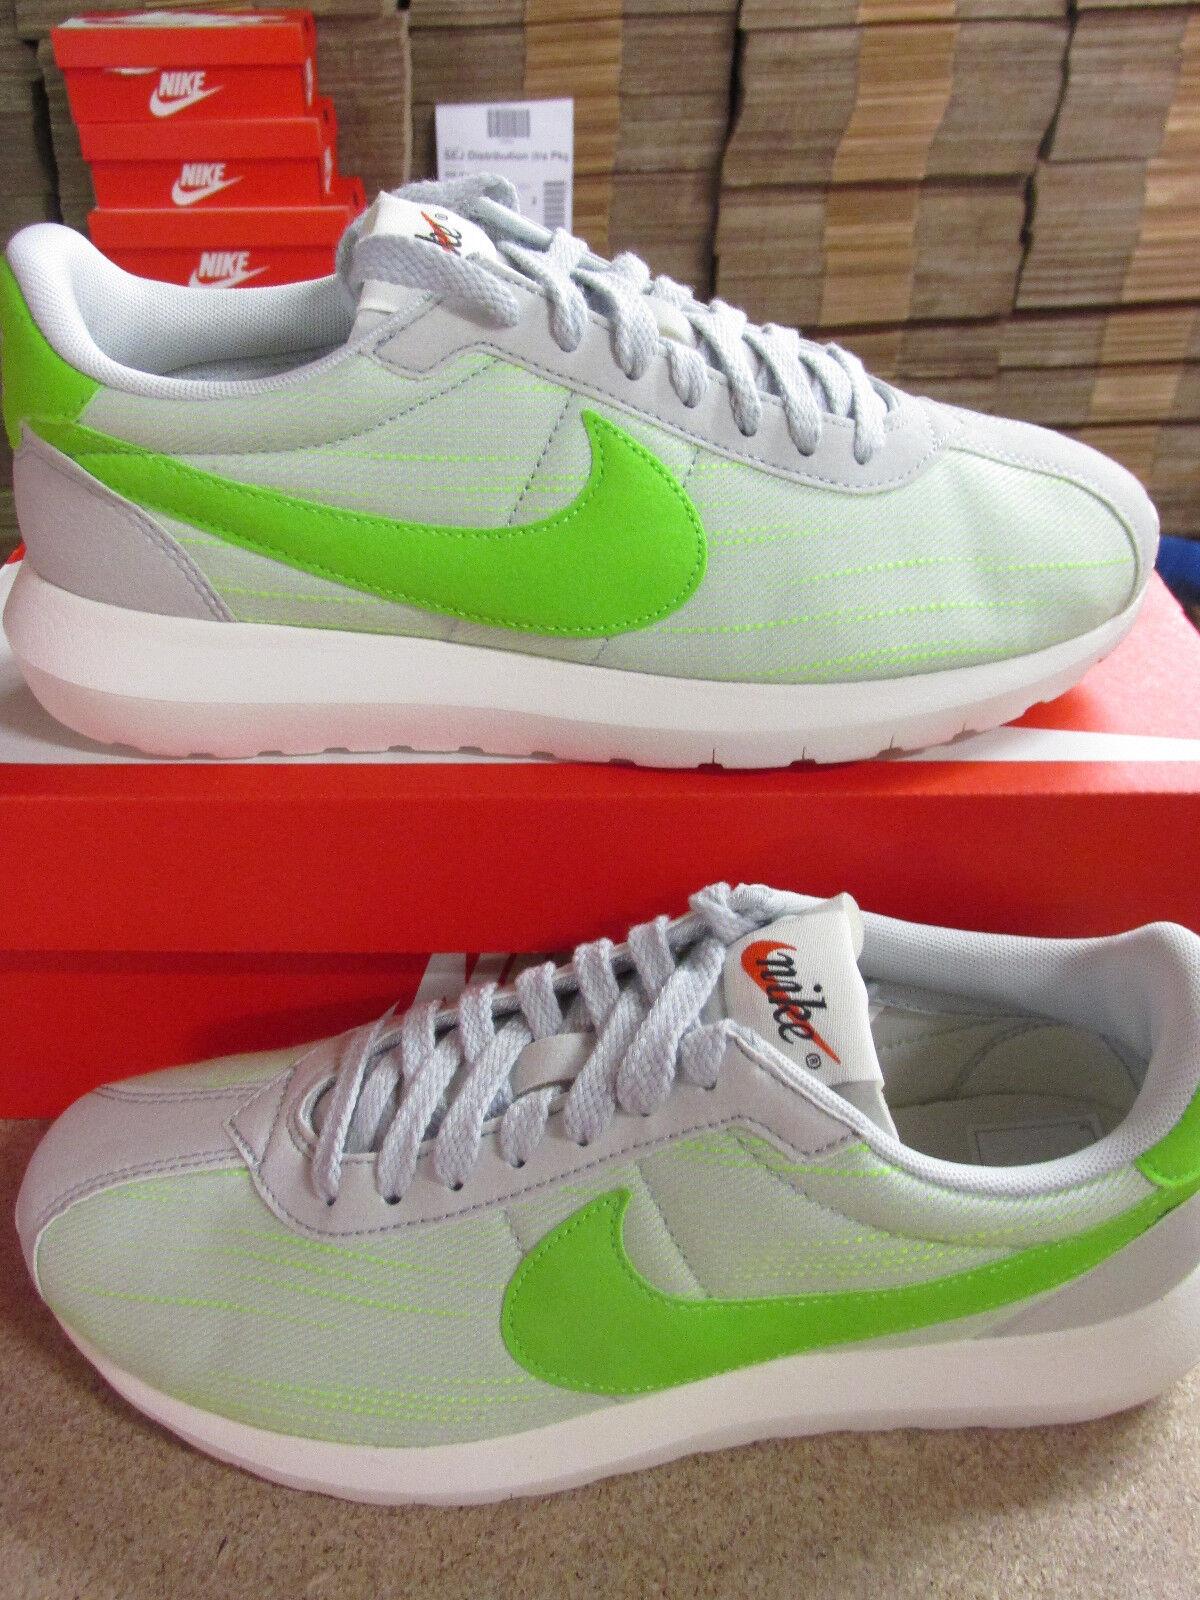 Nike Donna Roshe LD-1000 Scarpe Sportive 819843 004 Scarpe da Tennis